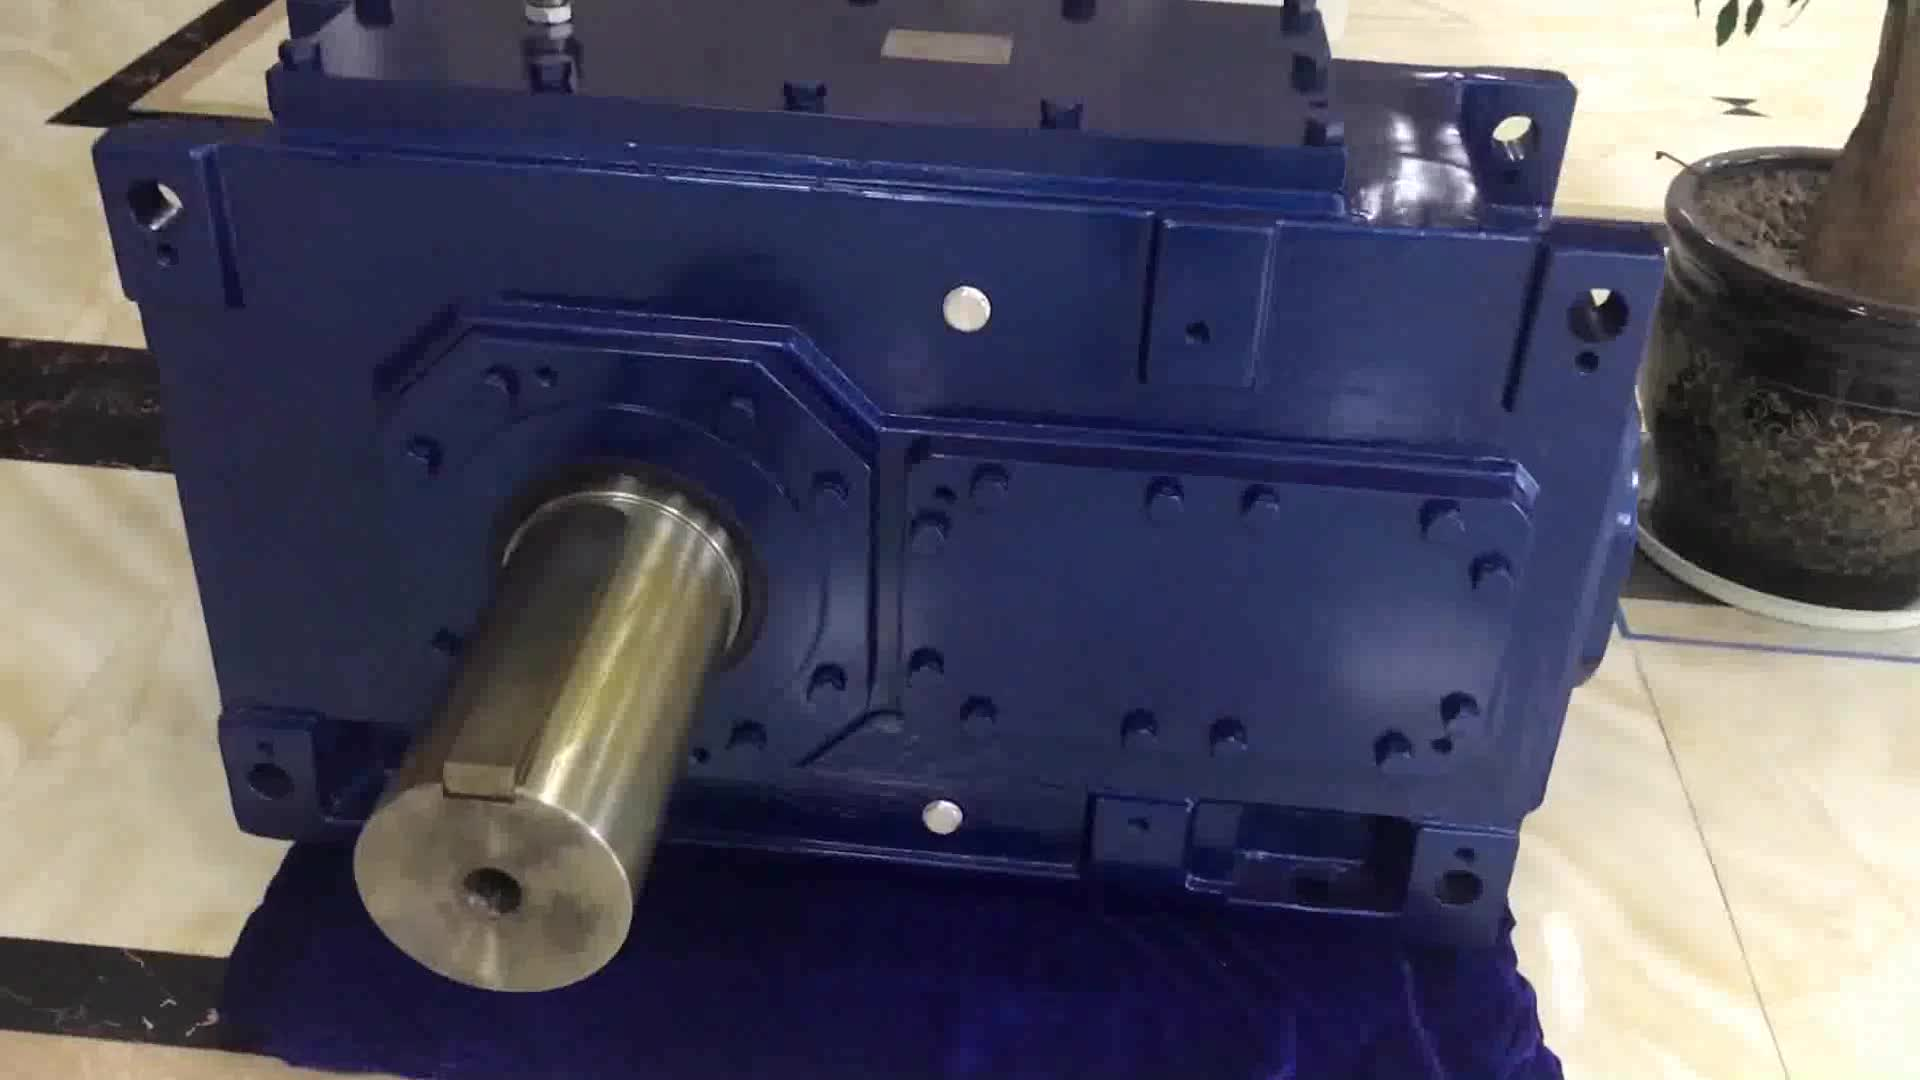 H/B series Heavy Duty Industrial vento caixa de velocidades, caixa de velocidades flende, série b caixa de velocidades